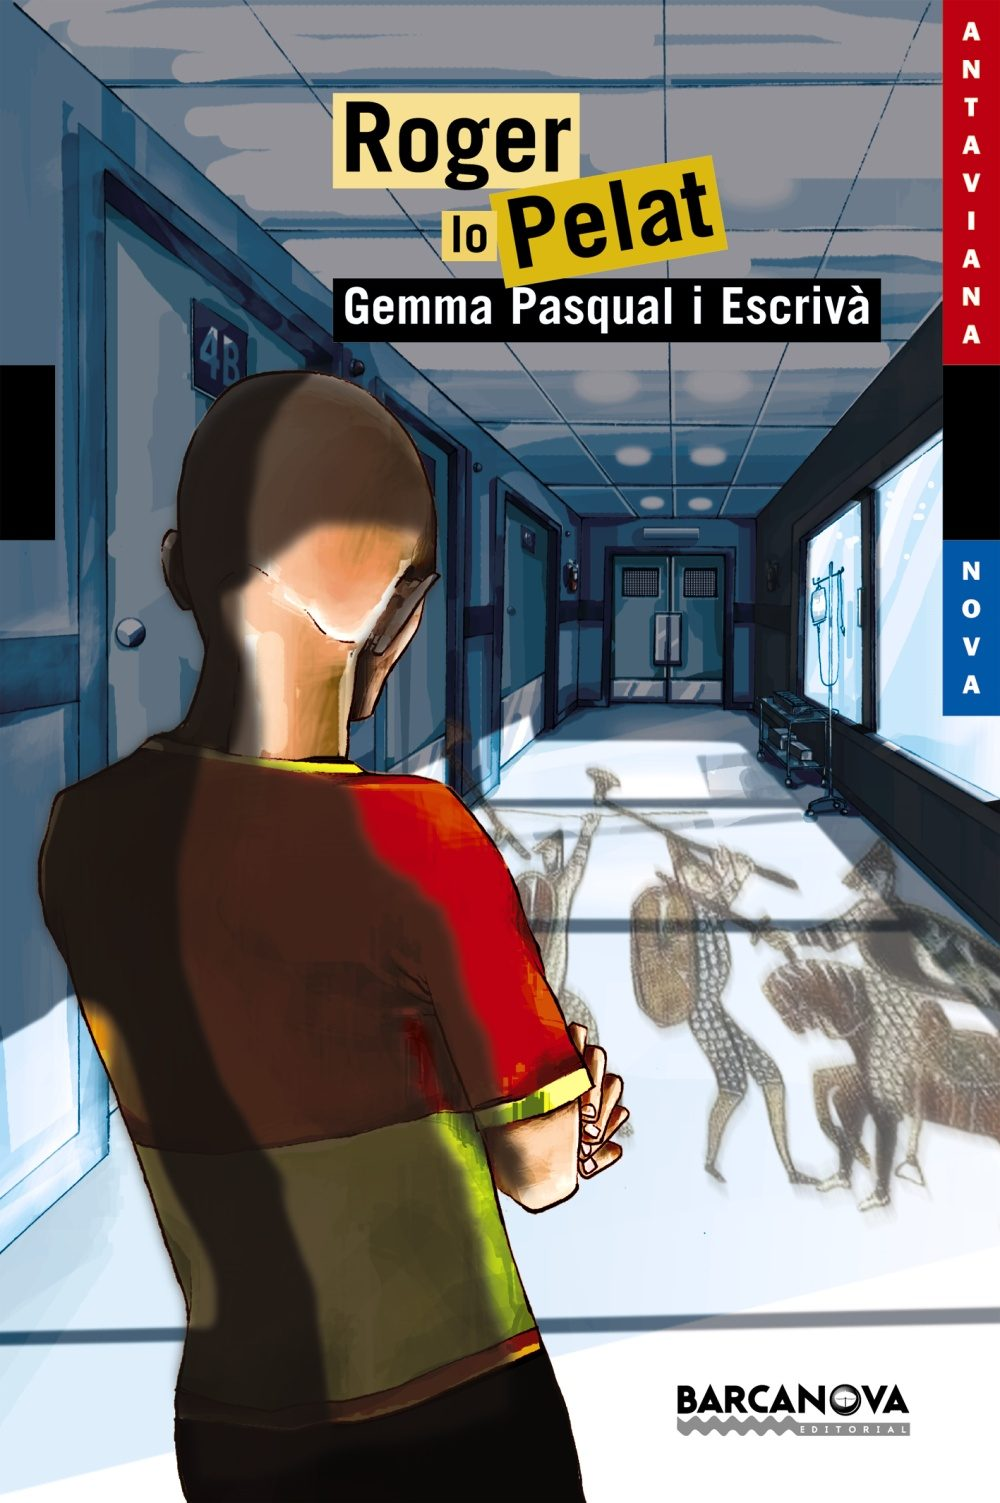 Roger Lo Pelat por Gemma Pasqual I Escriva epub